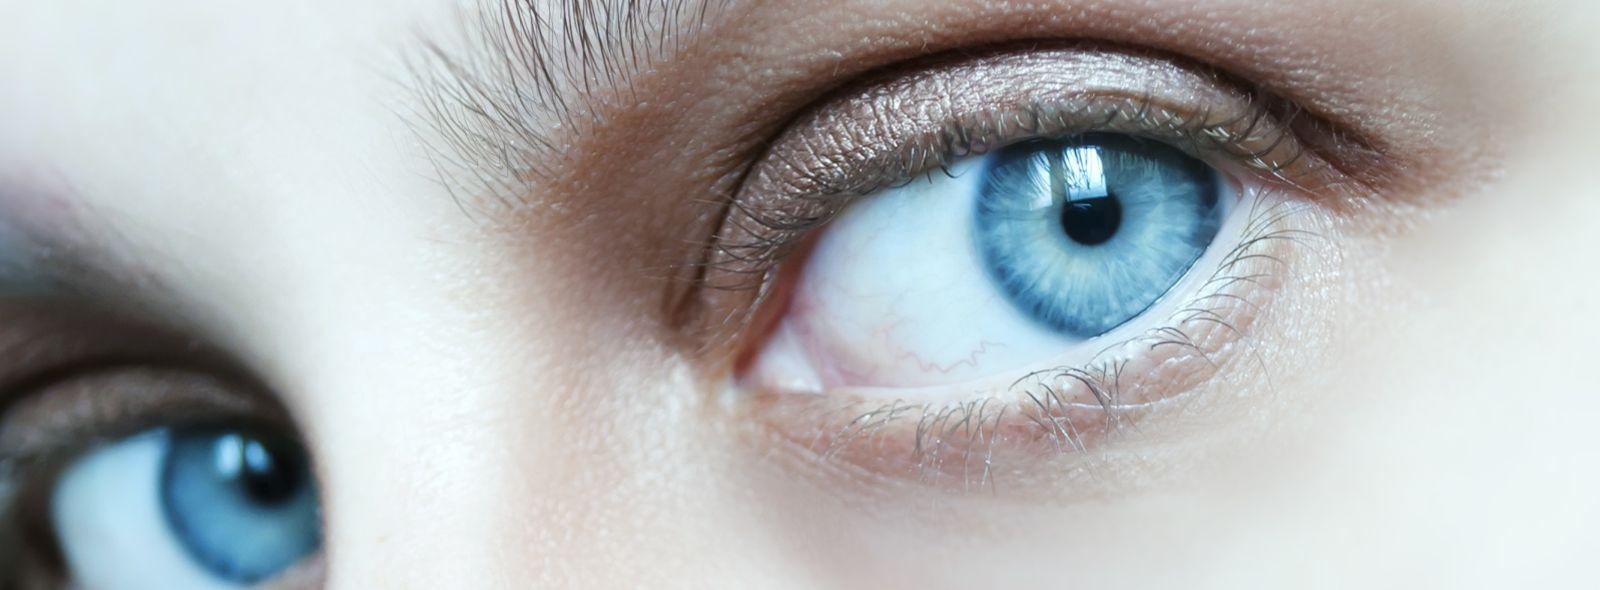 Come combattere le occhiaie nerissime